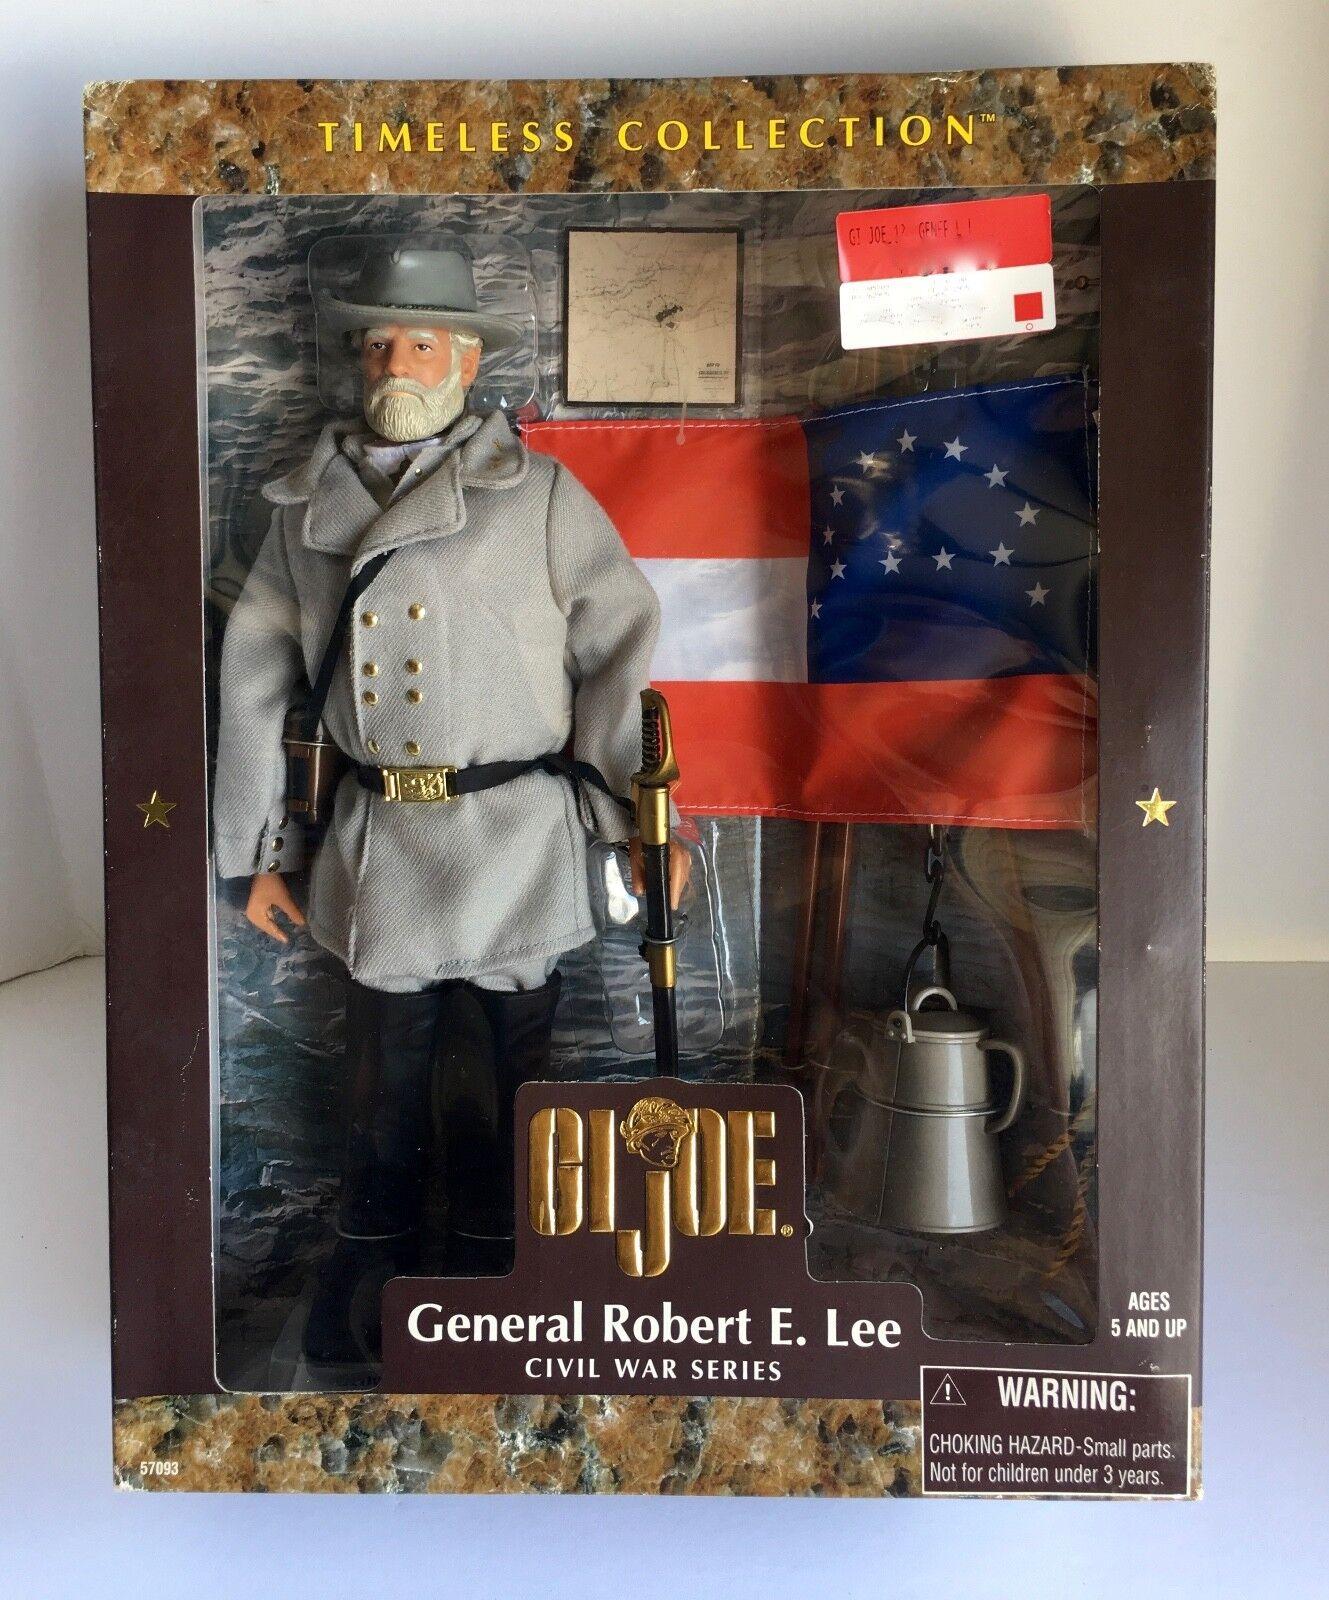 G. I. Joe GENERAL ROBERT E. LEE  Civil War Series Timeless Collection GJ-1